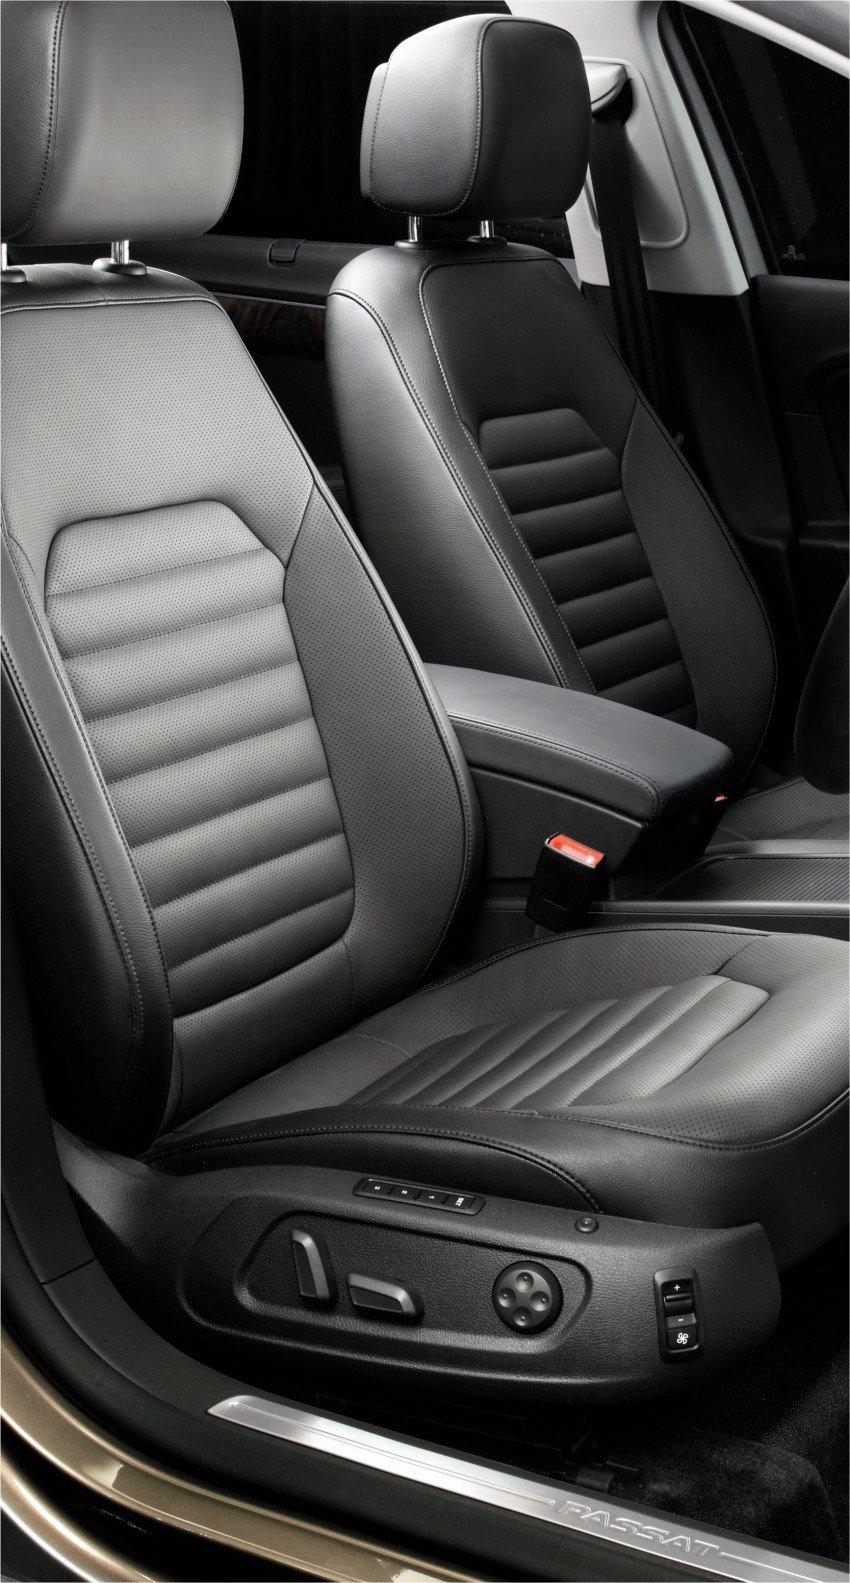 Volkswagen Passat updated with more kit, RM171k Image #240476